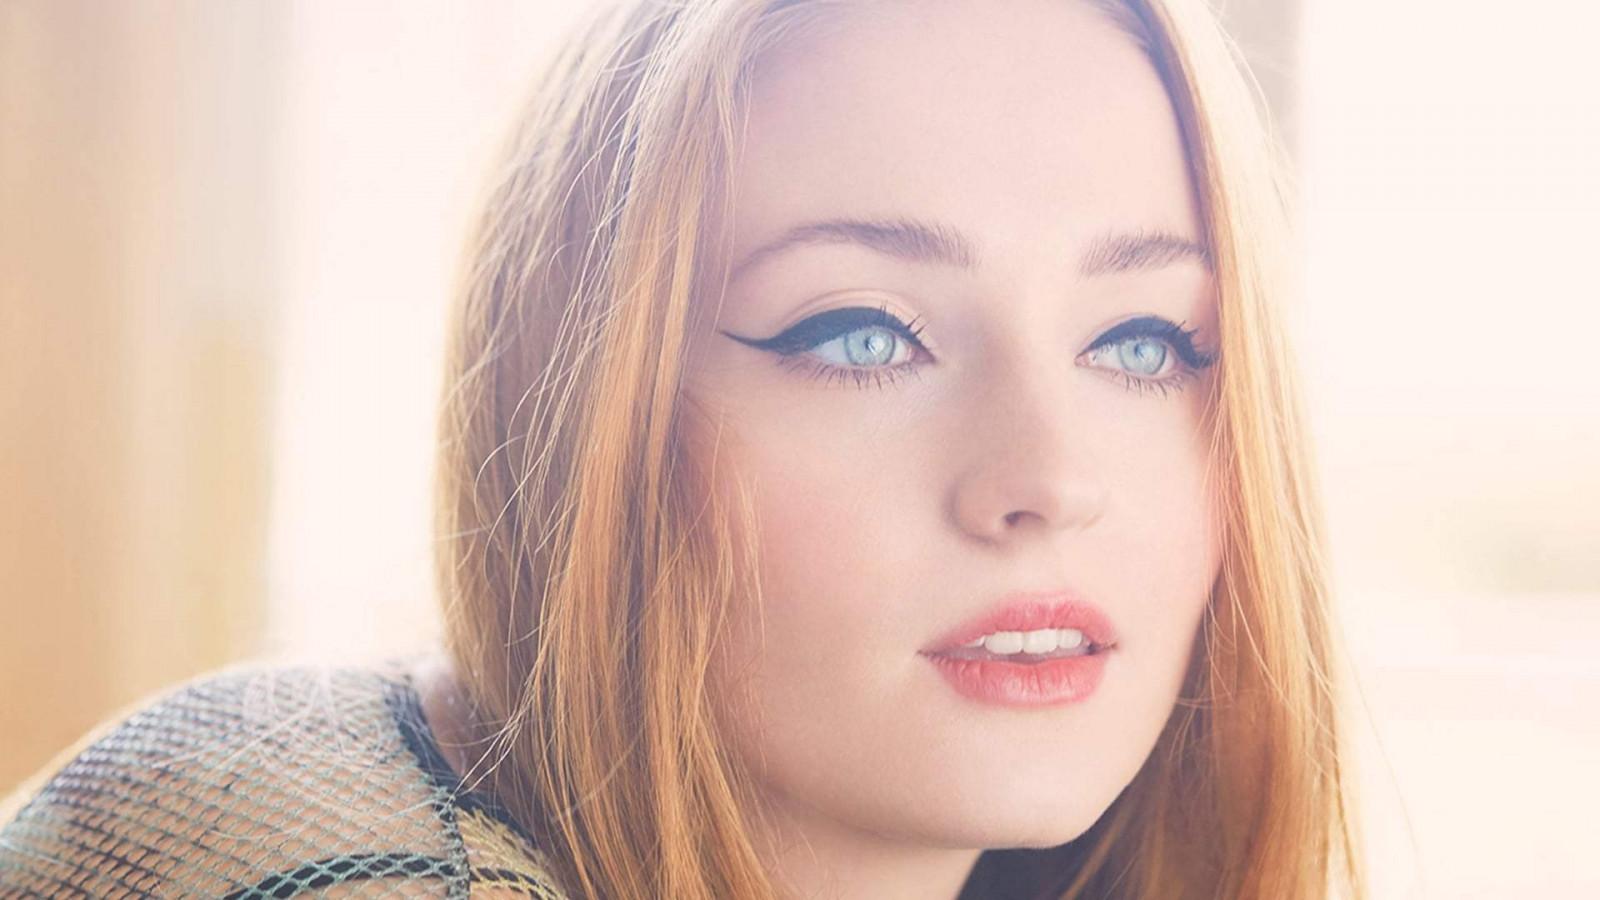 Red Lipstick Brown Hair Blue Eyes: Wallpaper : Face, Women, Redhead, Model, Long Hair, Blue